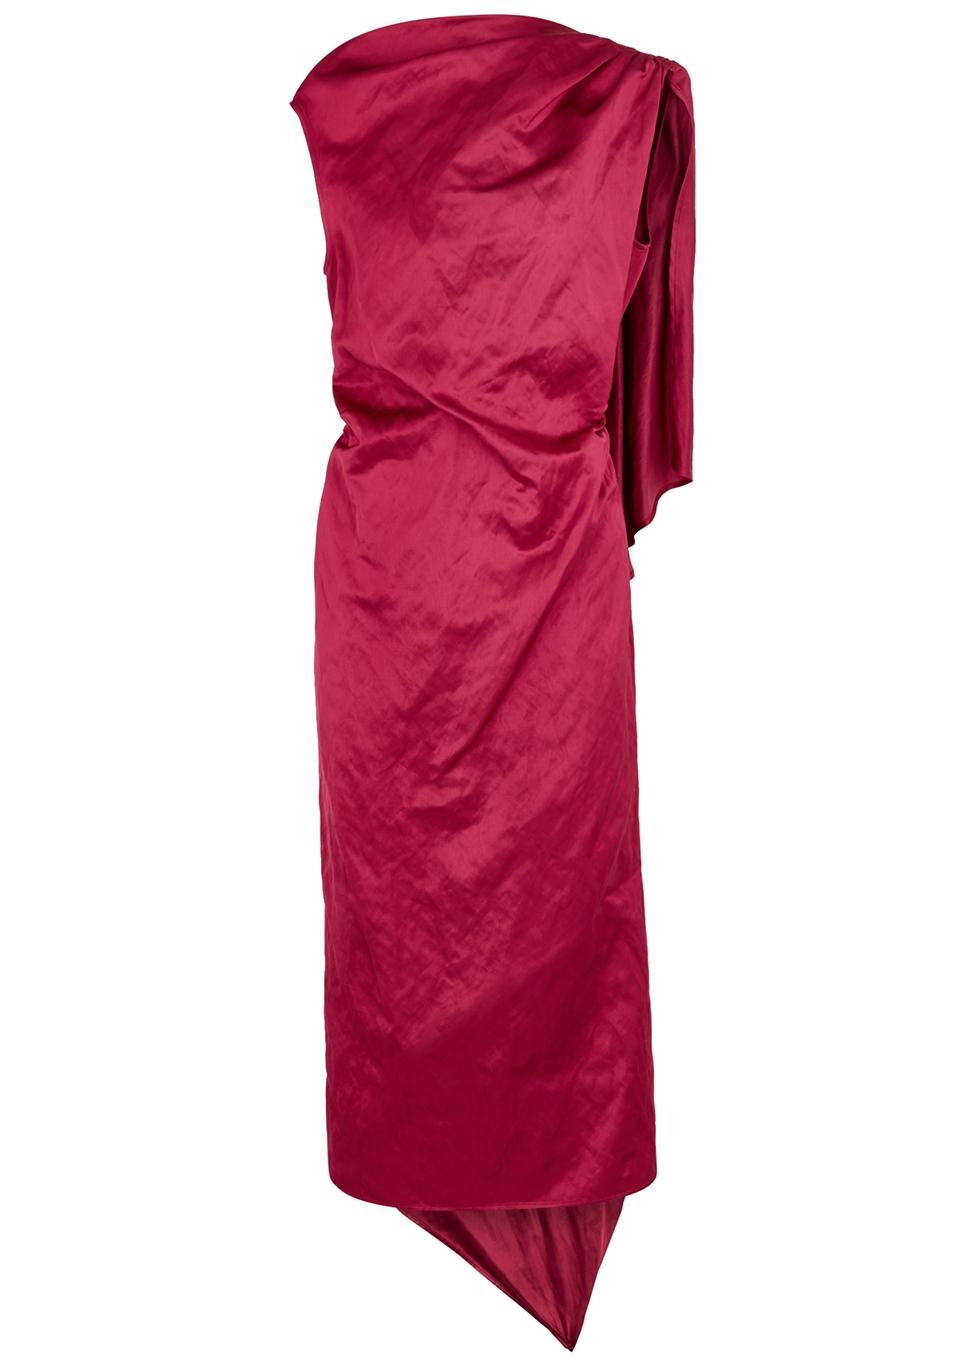 Diala red satin midi dress - Dries Van Noten